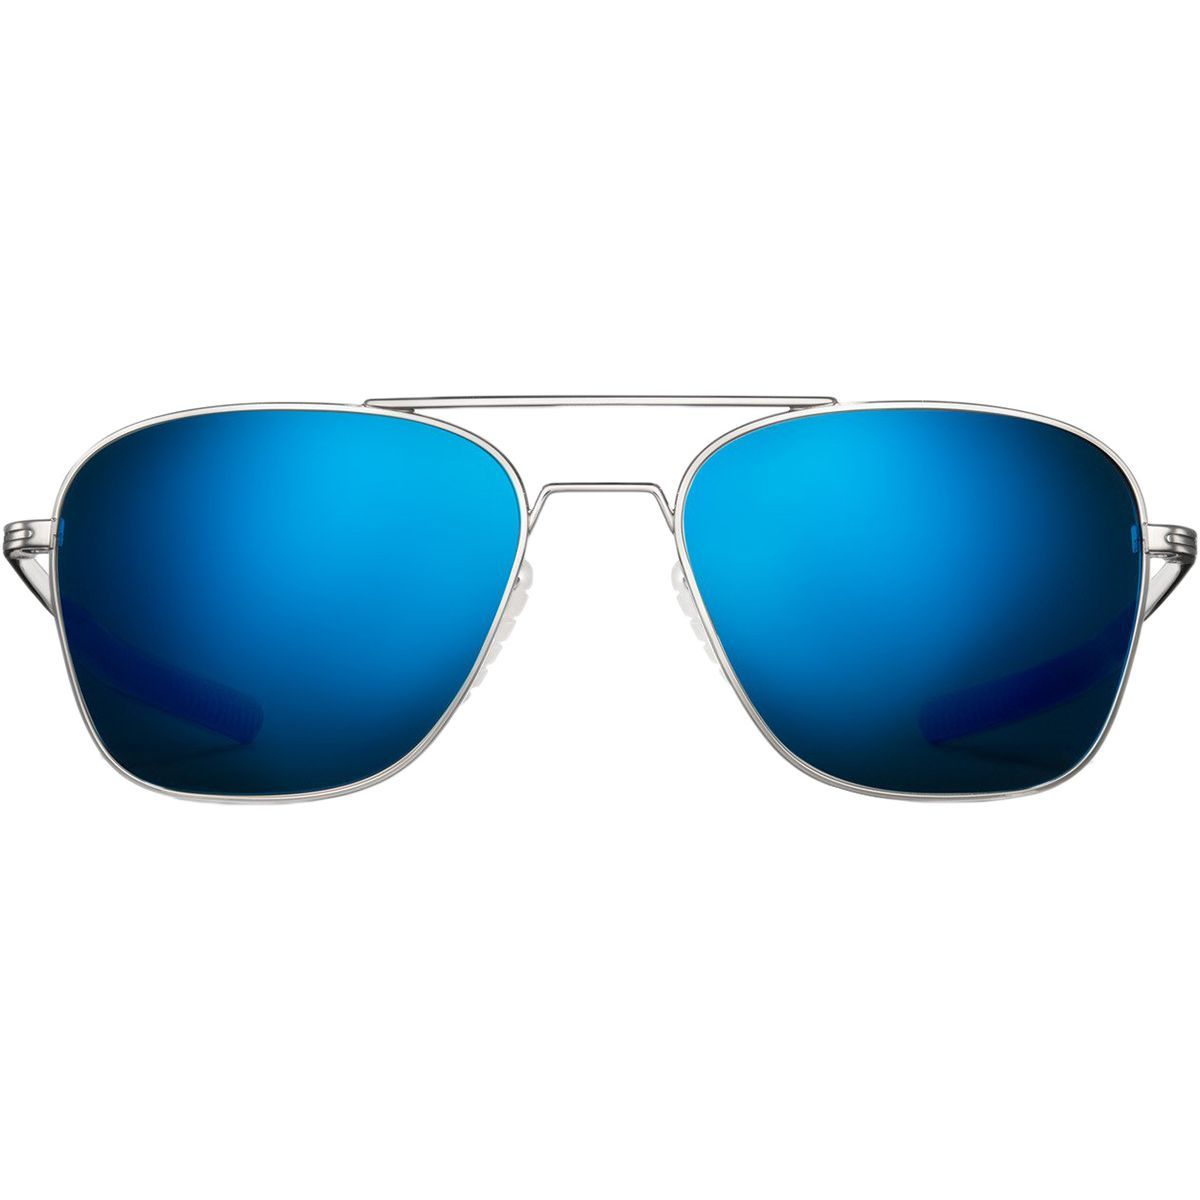 Roka Falcon Titanium Sunglasses - Women's